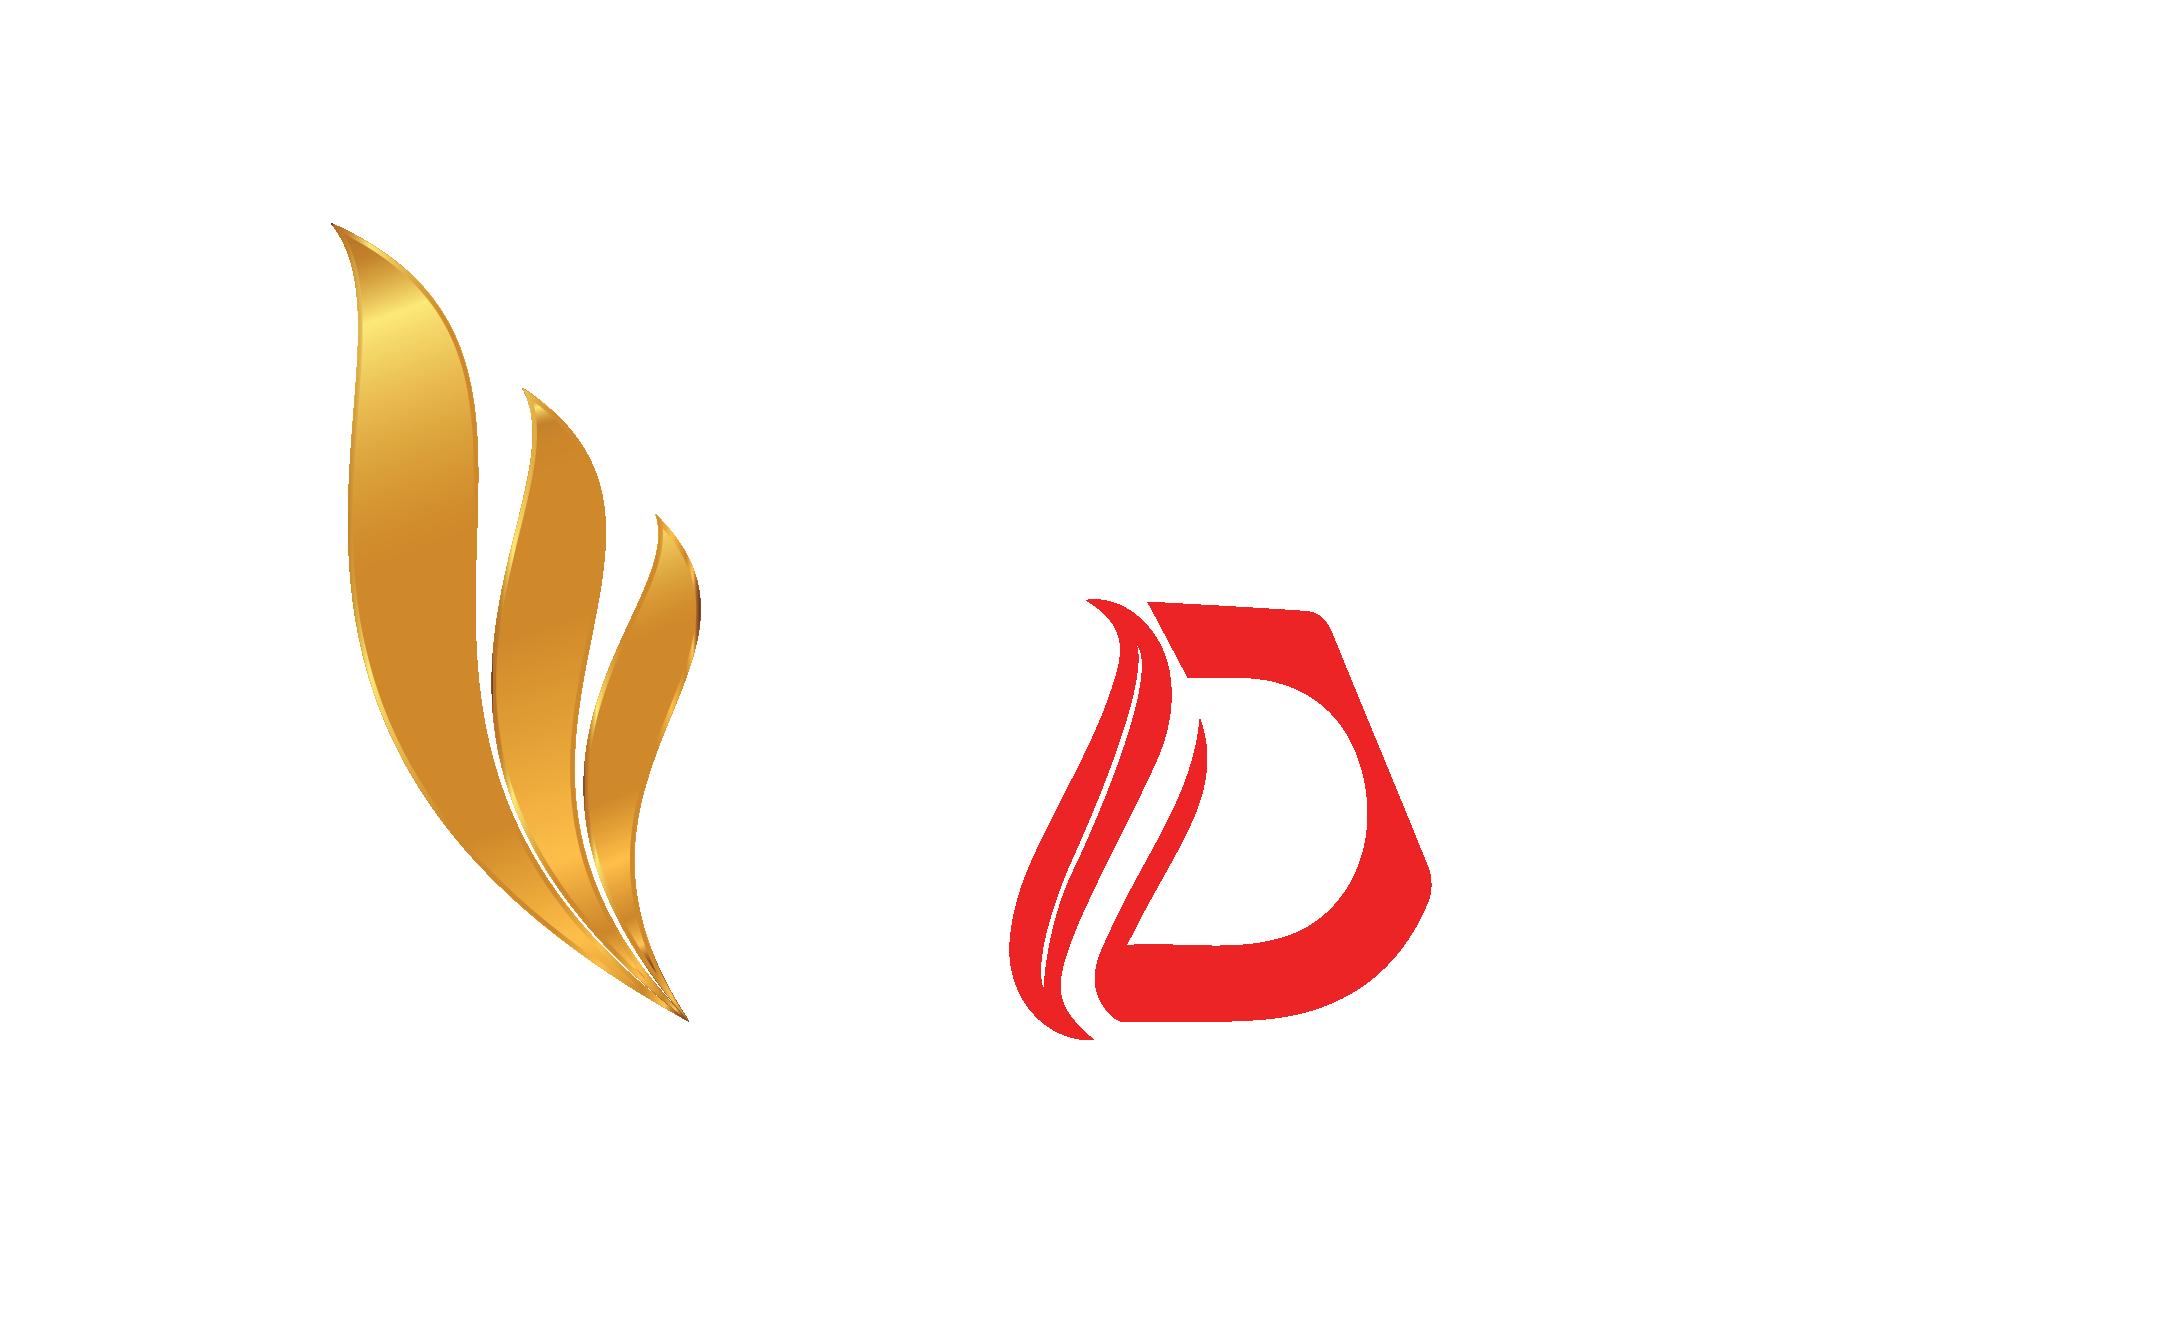 zhuridivas.com